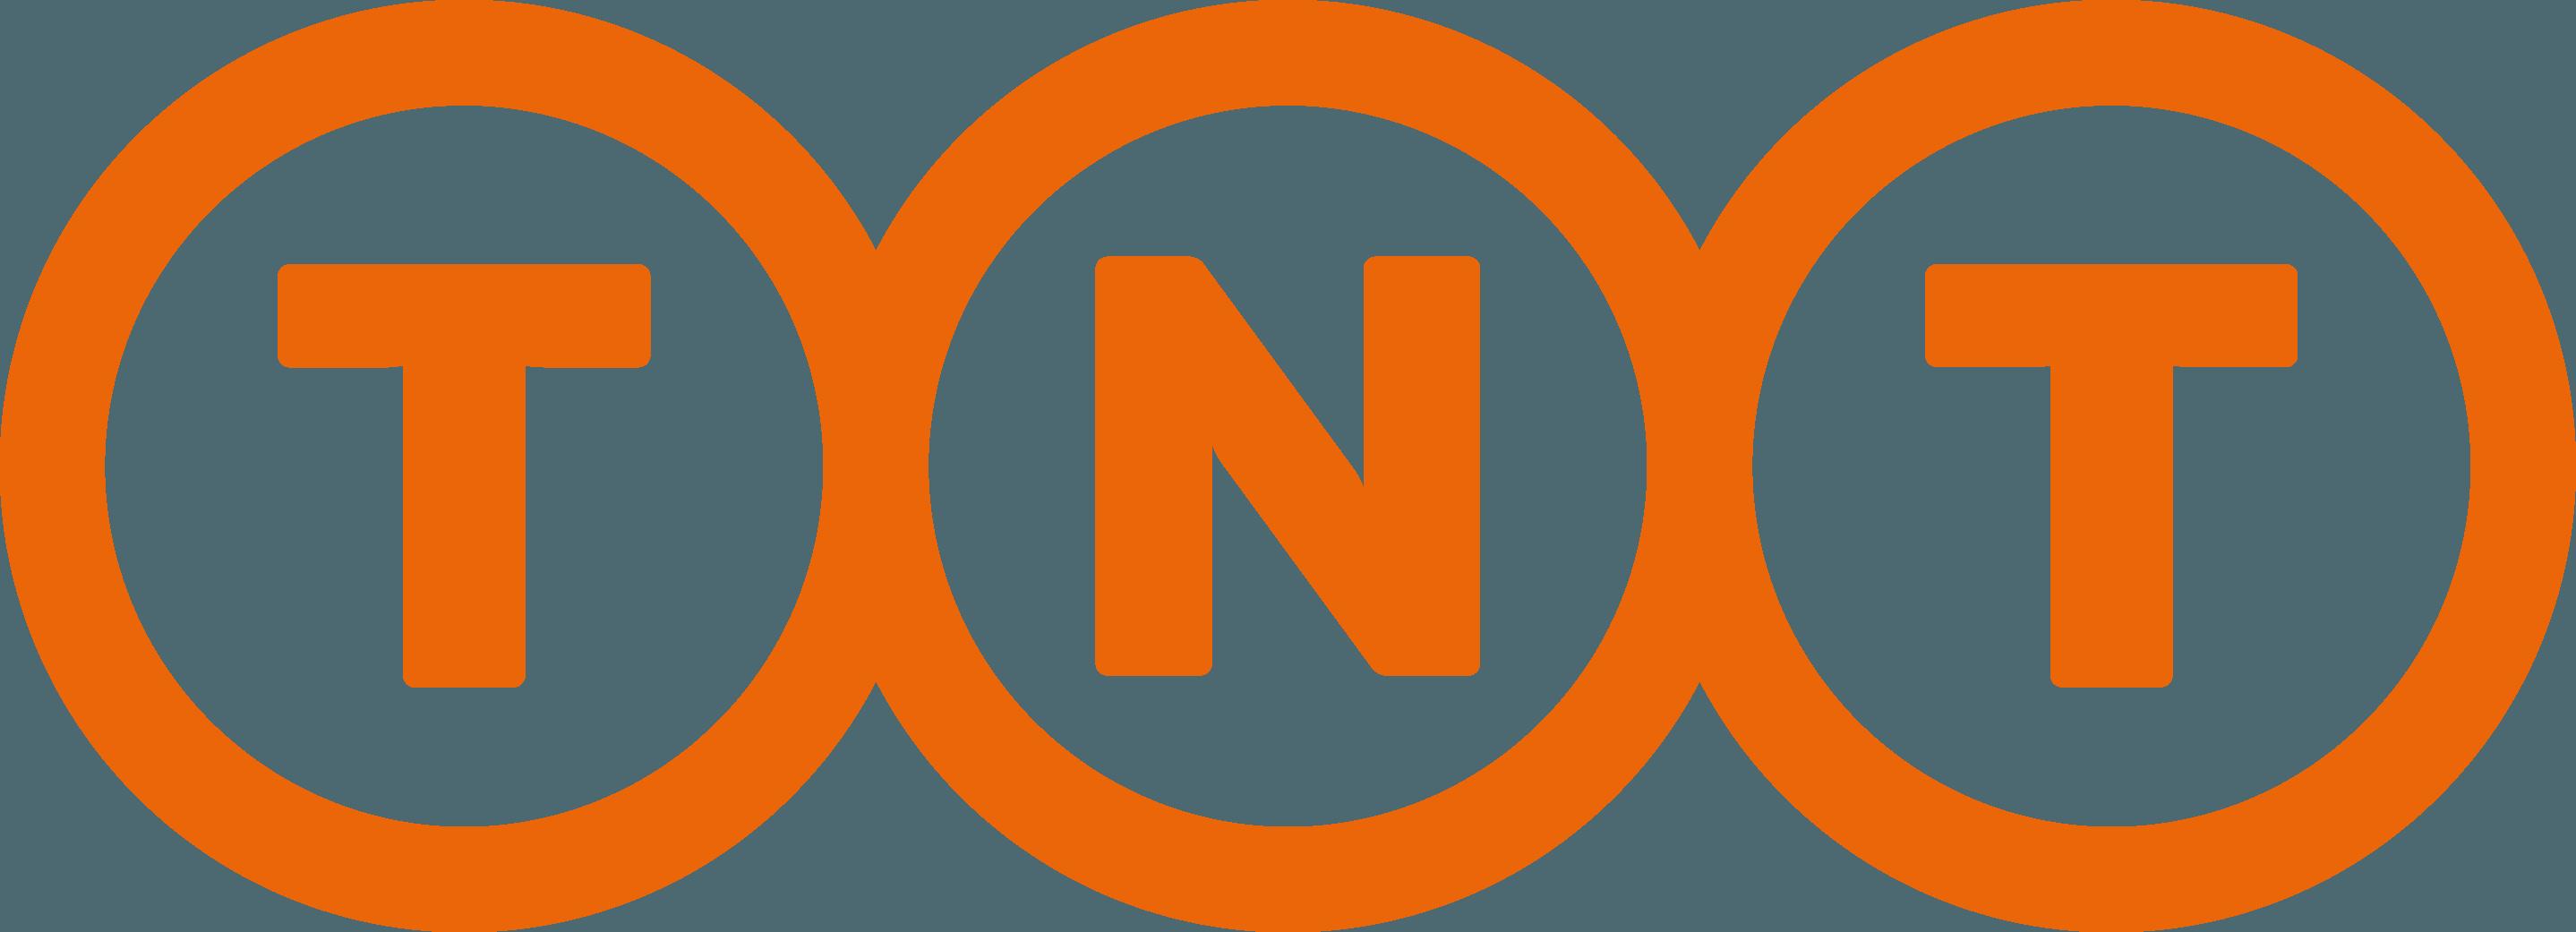 TNT Express Logo png